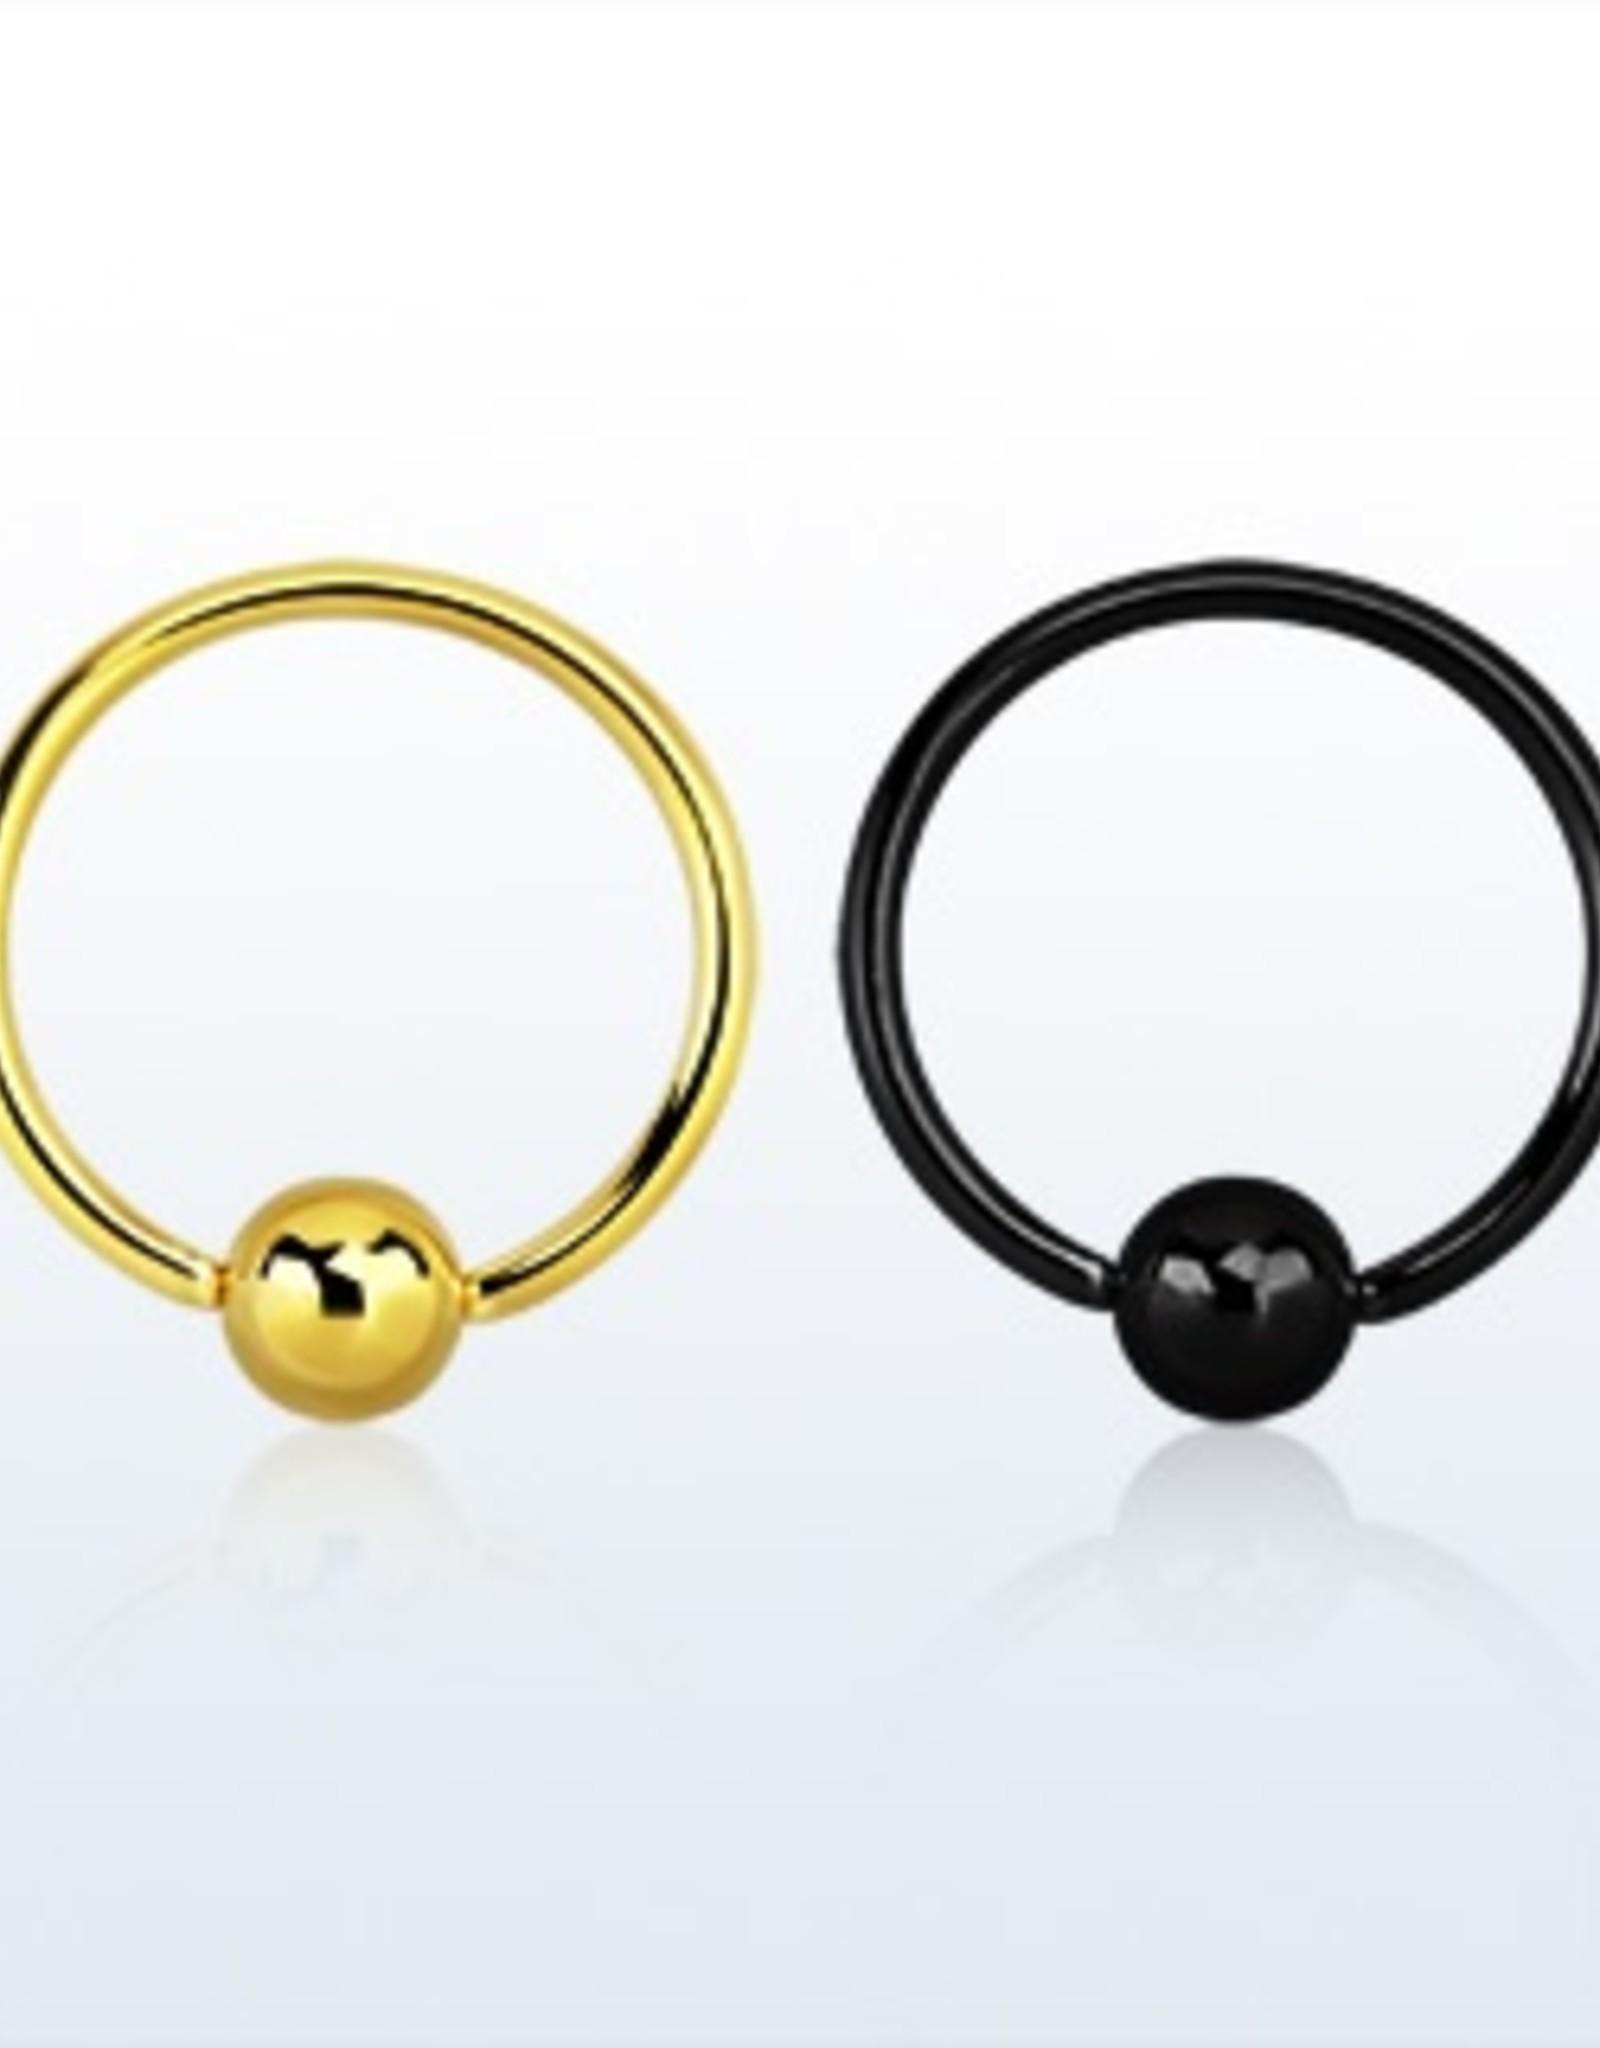 Anodized ball closure ring - 20g (eyebrow), 3mm ball-8MM-Black